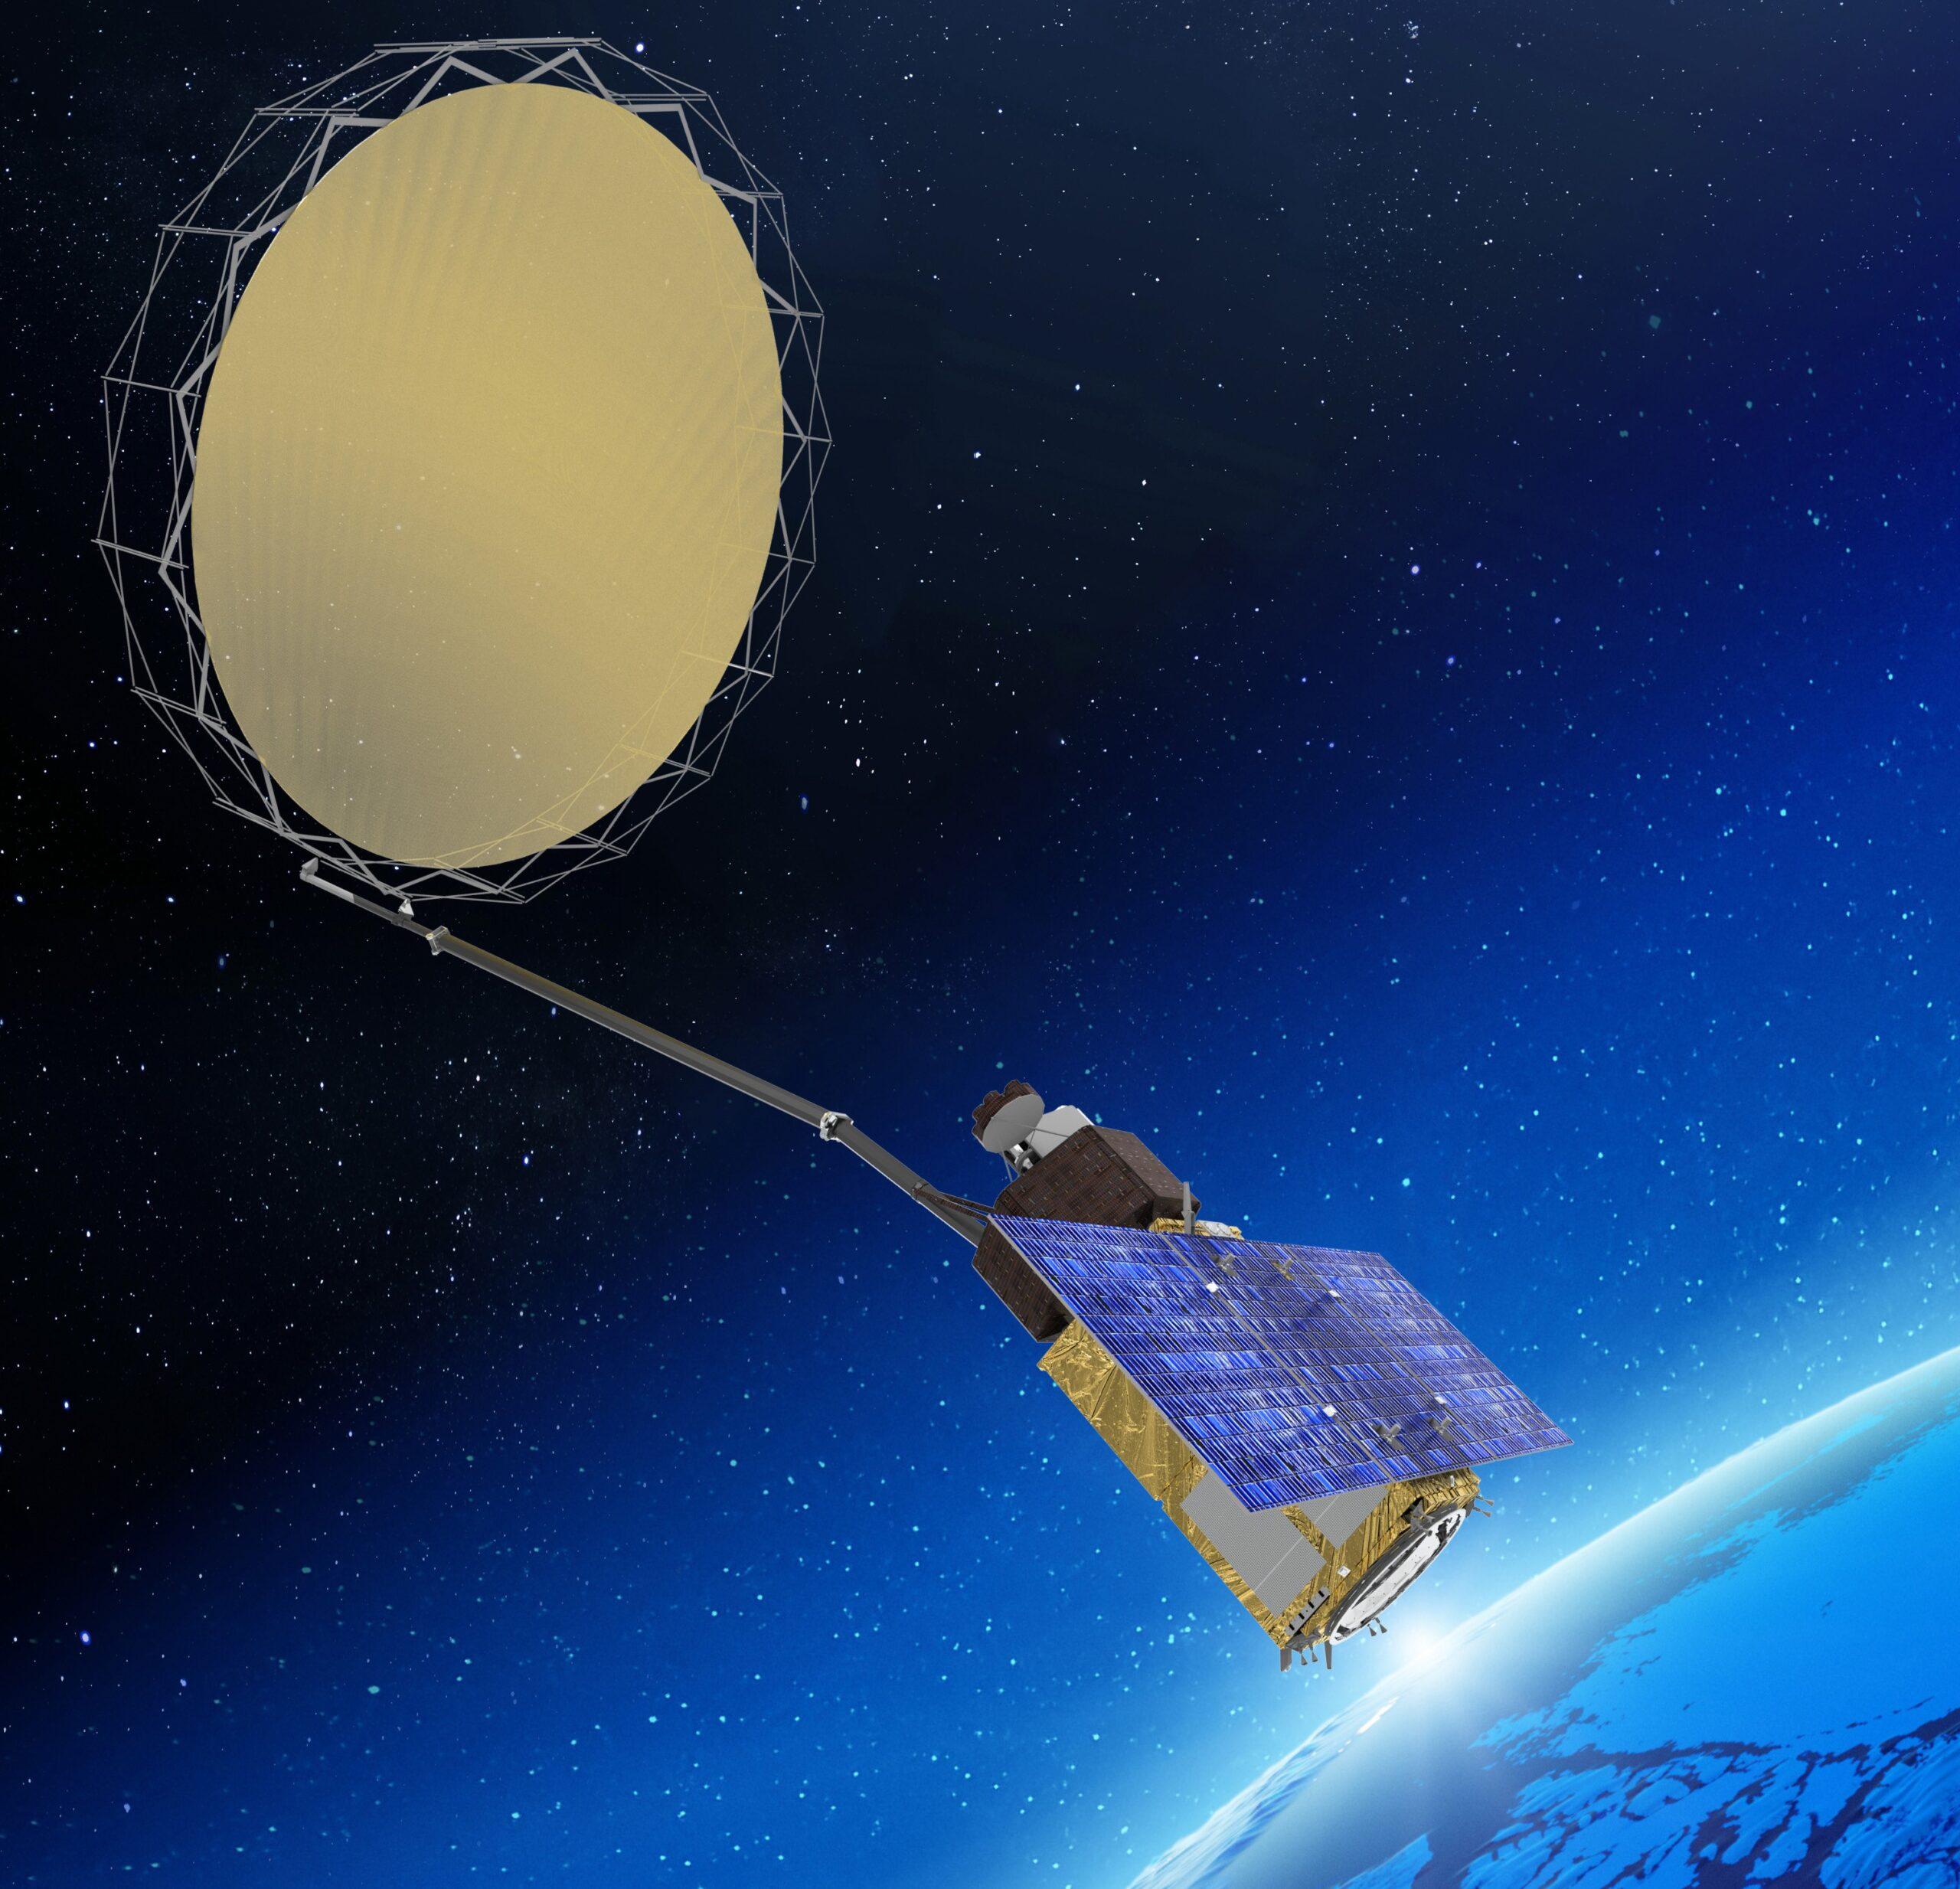 Un render del satellite CIMR Copernicus. Credits: ESA/Thales Alenia Space